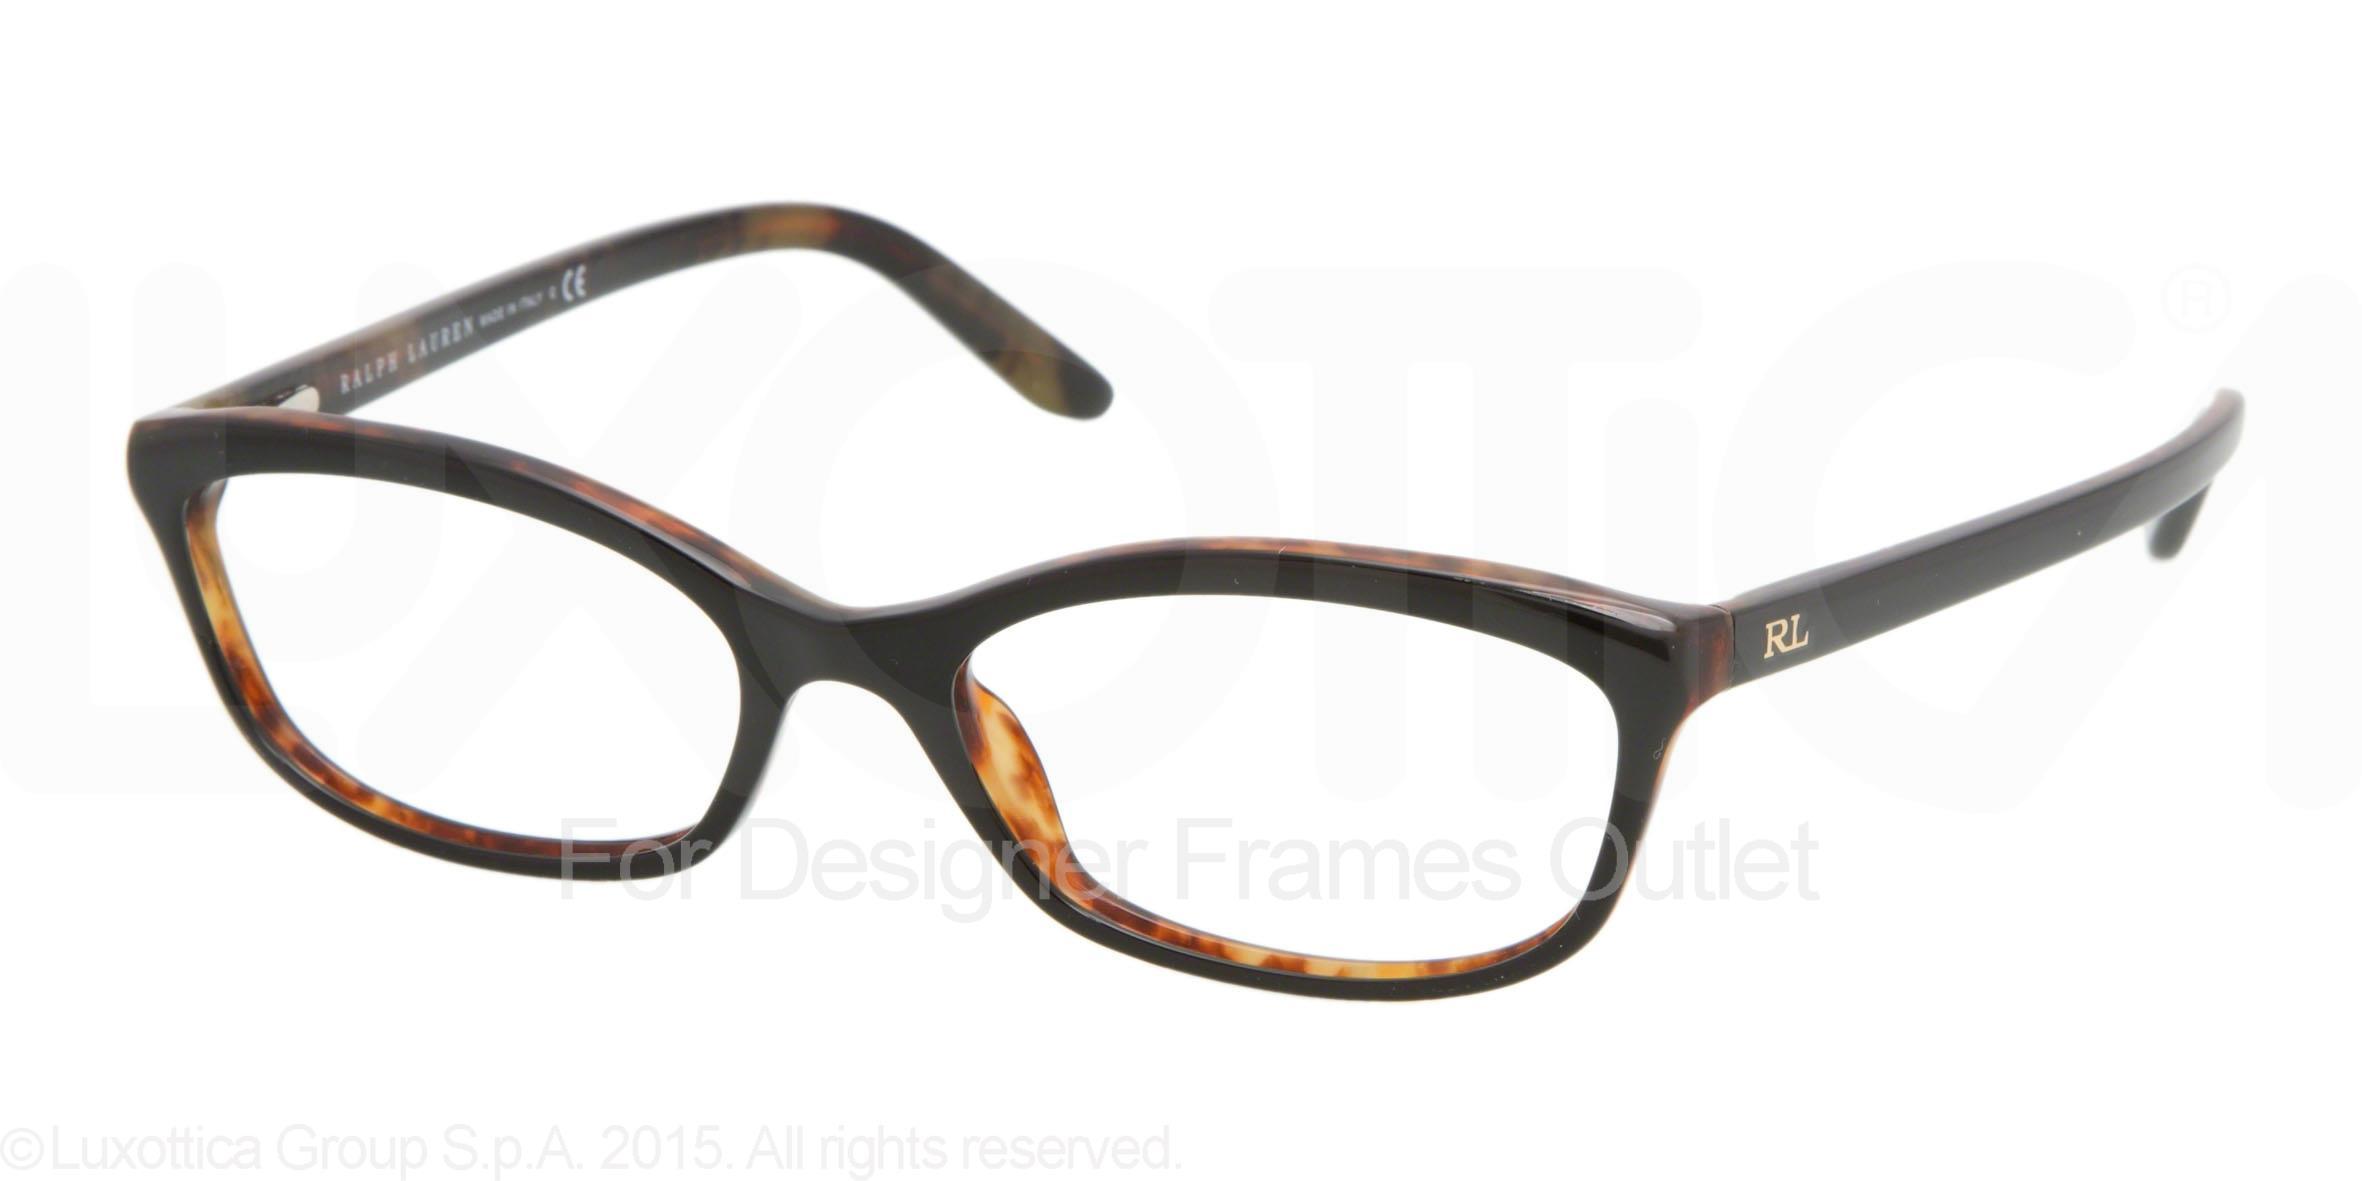 Stores That Sell Ralph Lauren Eyeglasses Prism